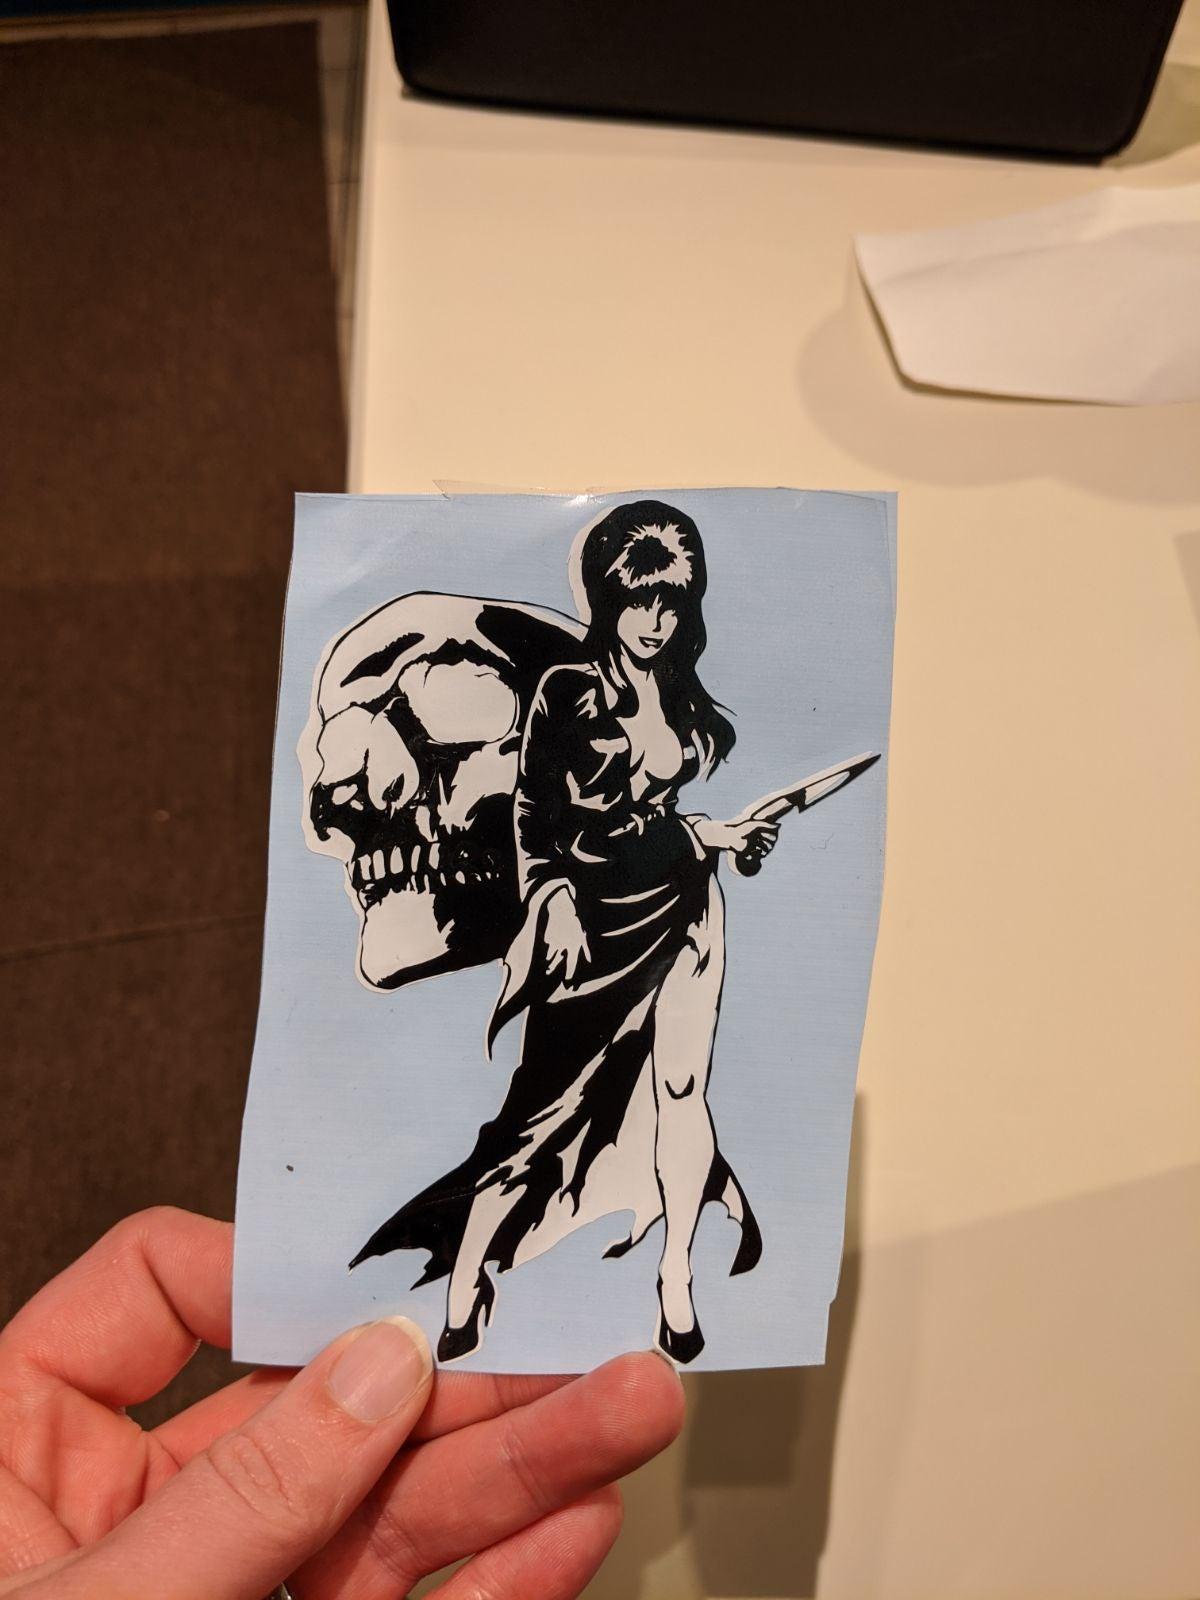 Elvira with skull decal